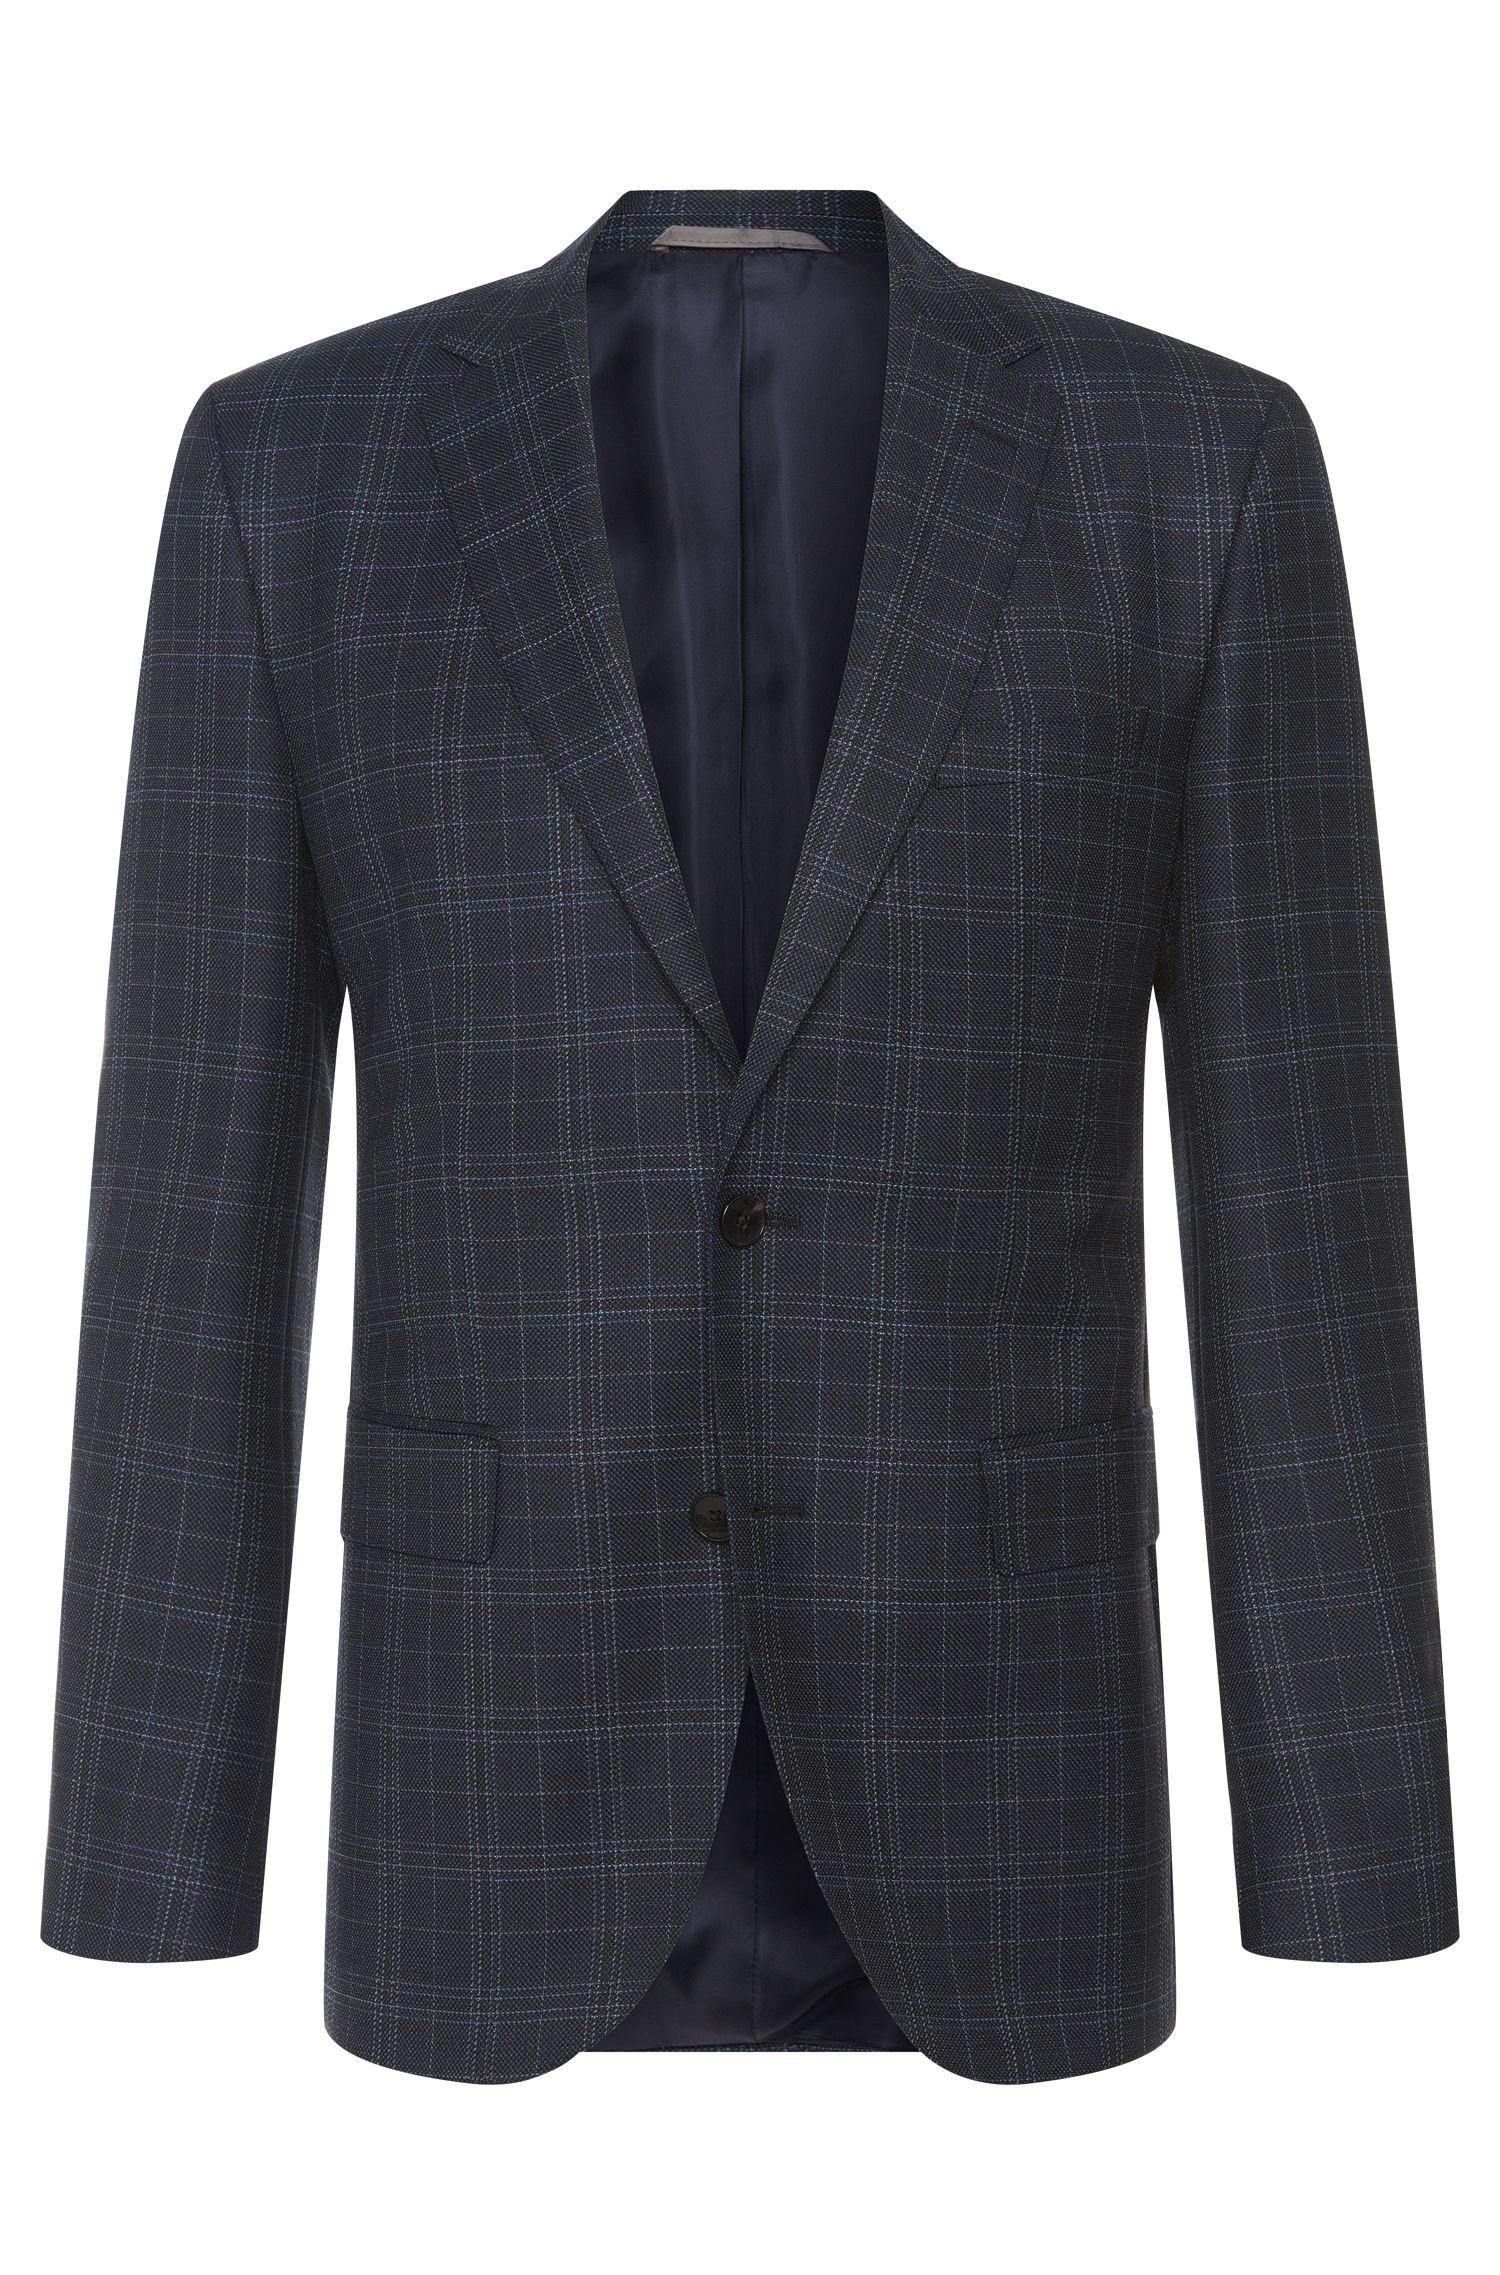 'Jeen' | Regular Fit, Super 110 Italian Virgin Wool Sport Coat